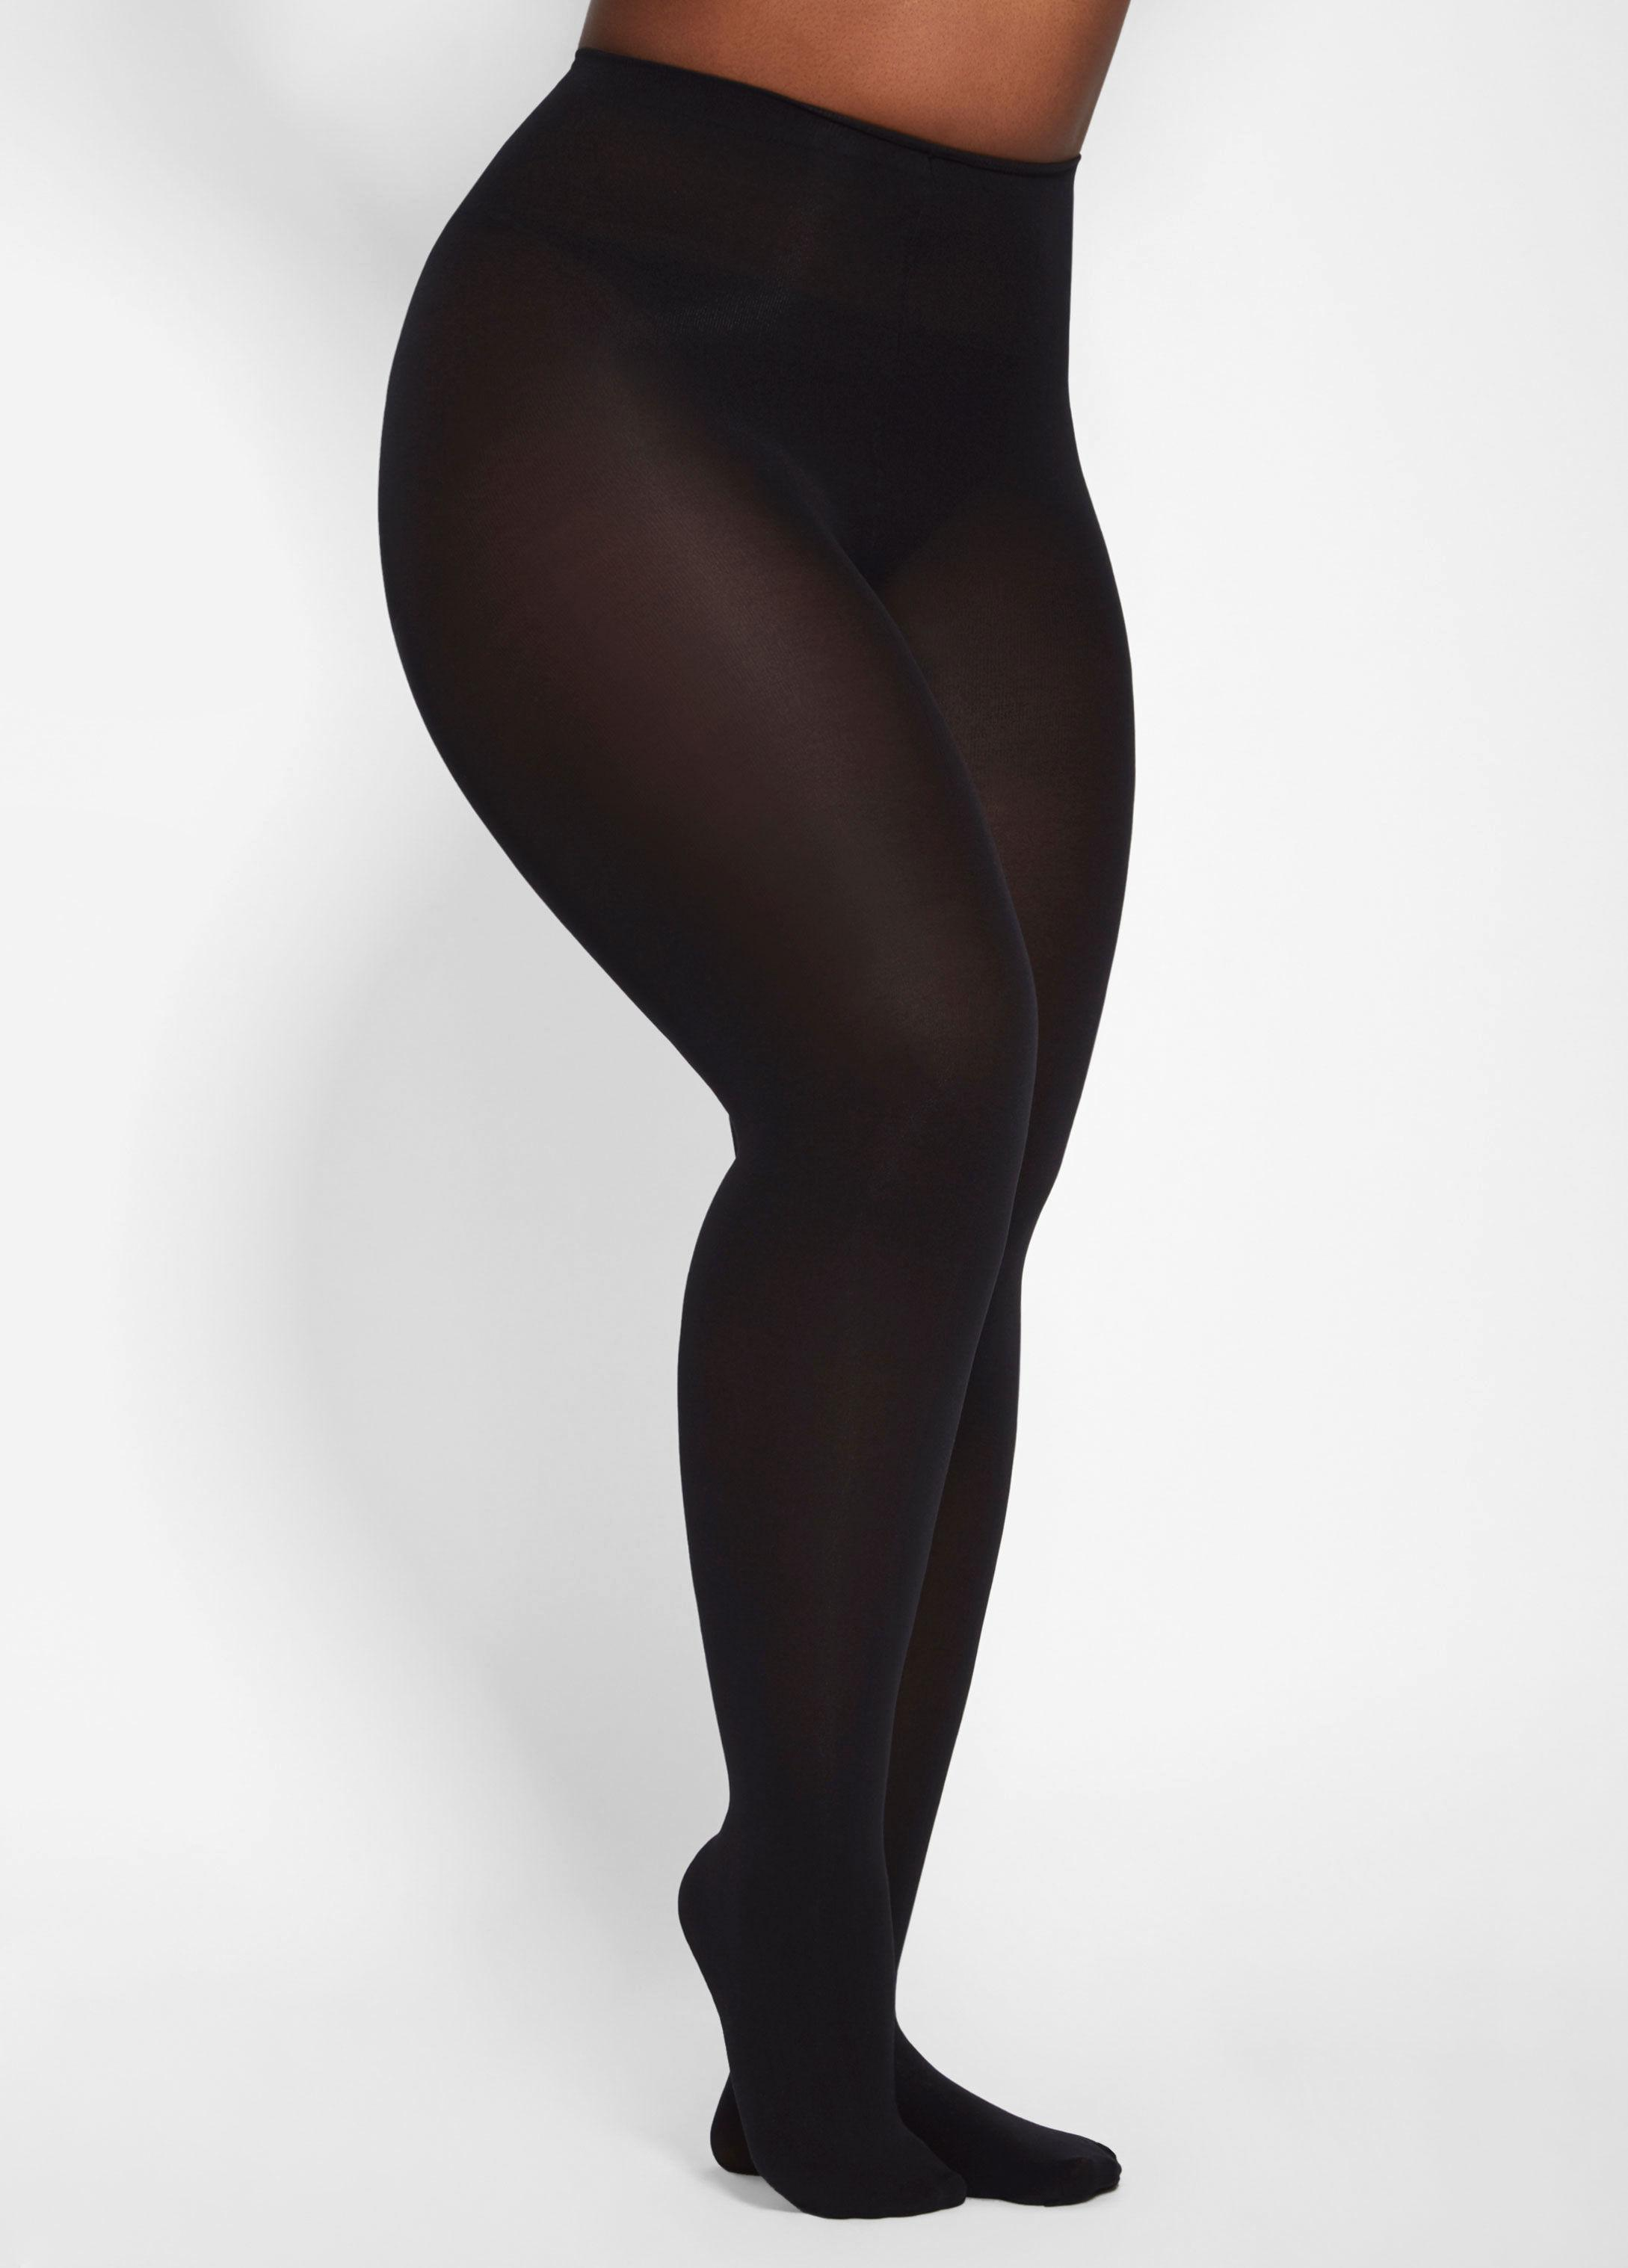 3da1039415d Lyst - Ashley Stewart Plus Size Basic Opaque Footed Tights in Black